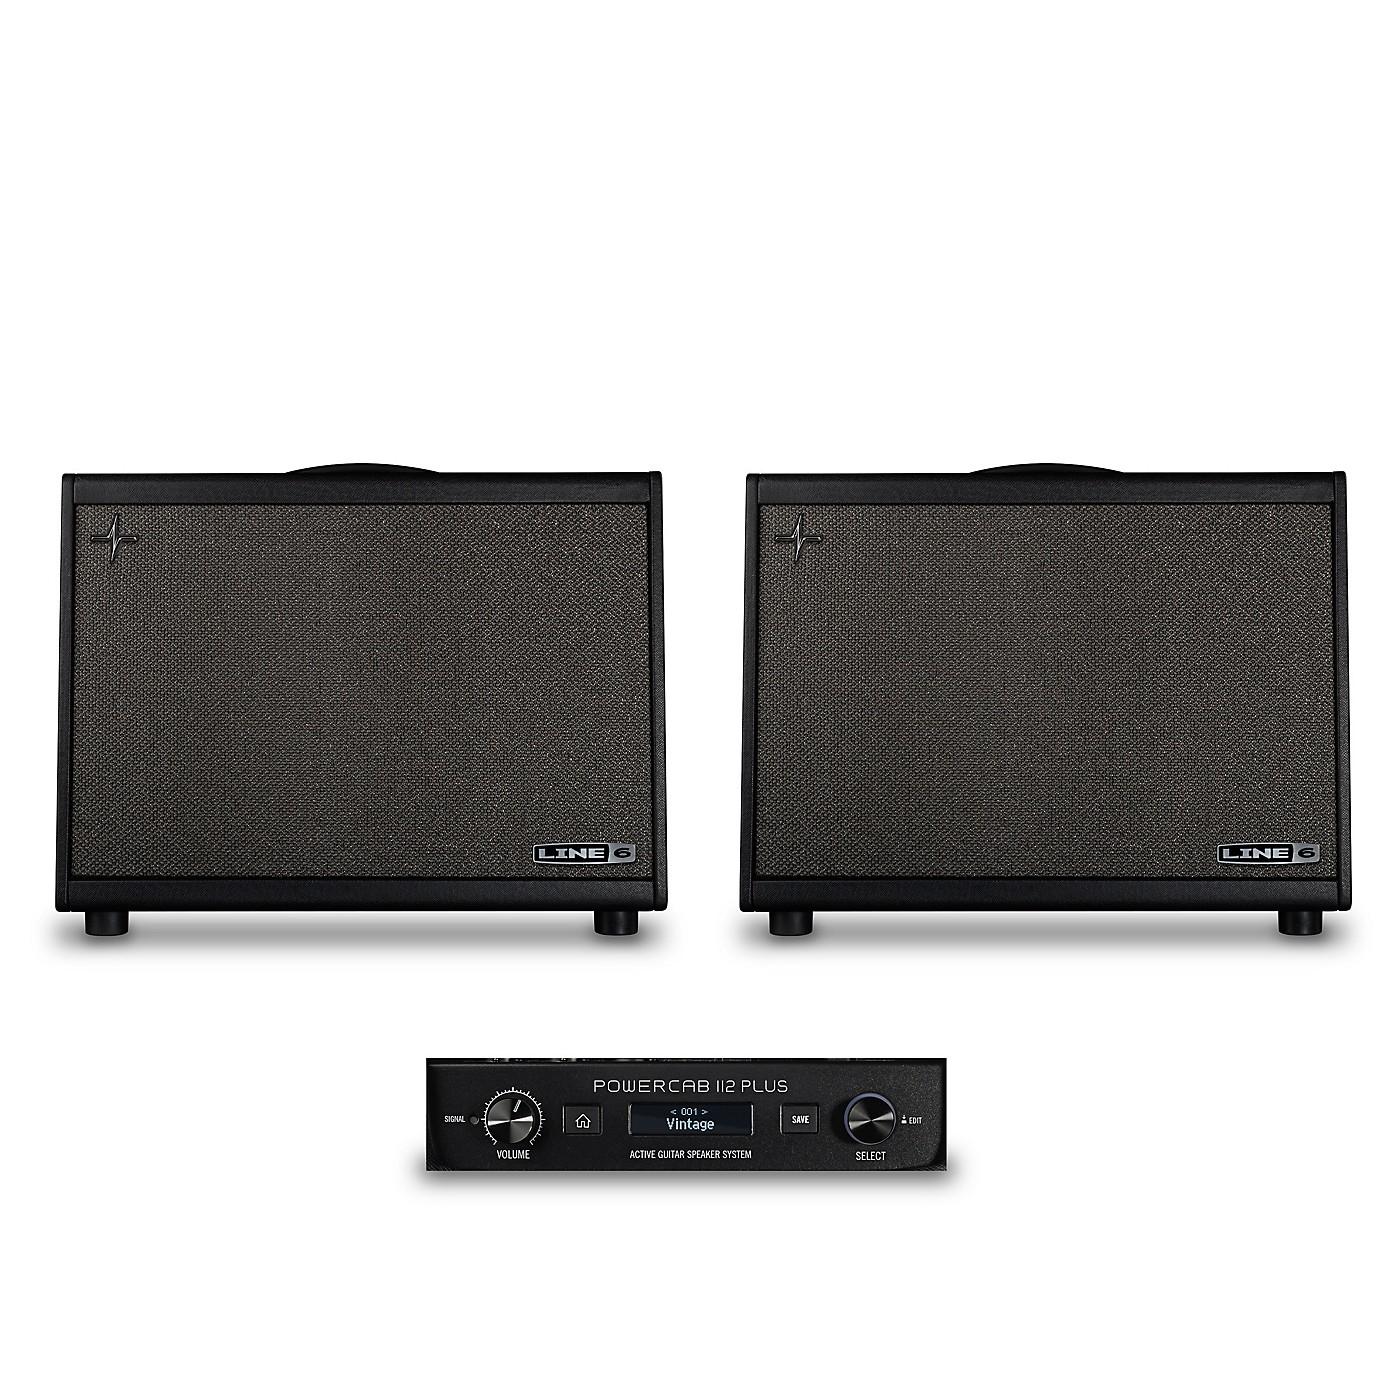 Line 6 Powercab 112 Plus 250W 1x12 FRFR Powered Speaker Cab Bundle thumbnail